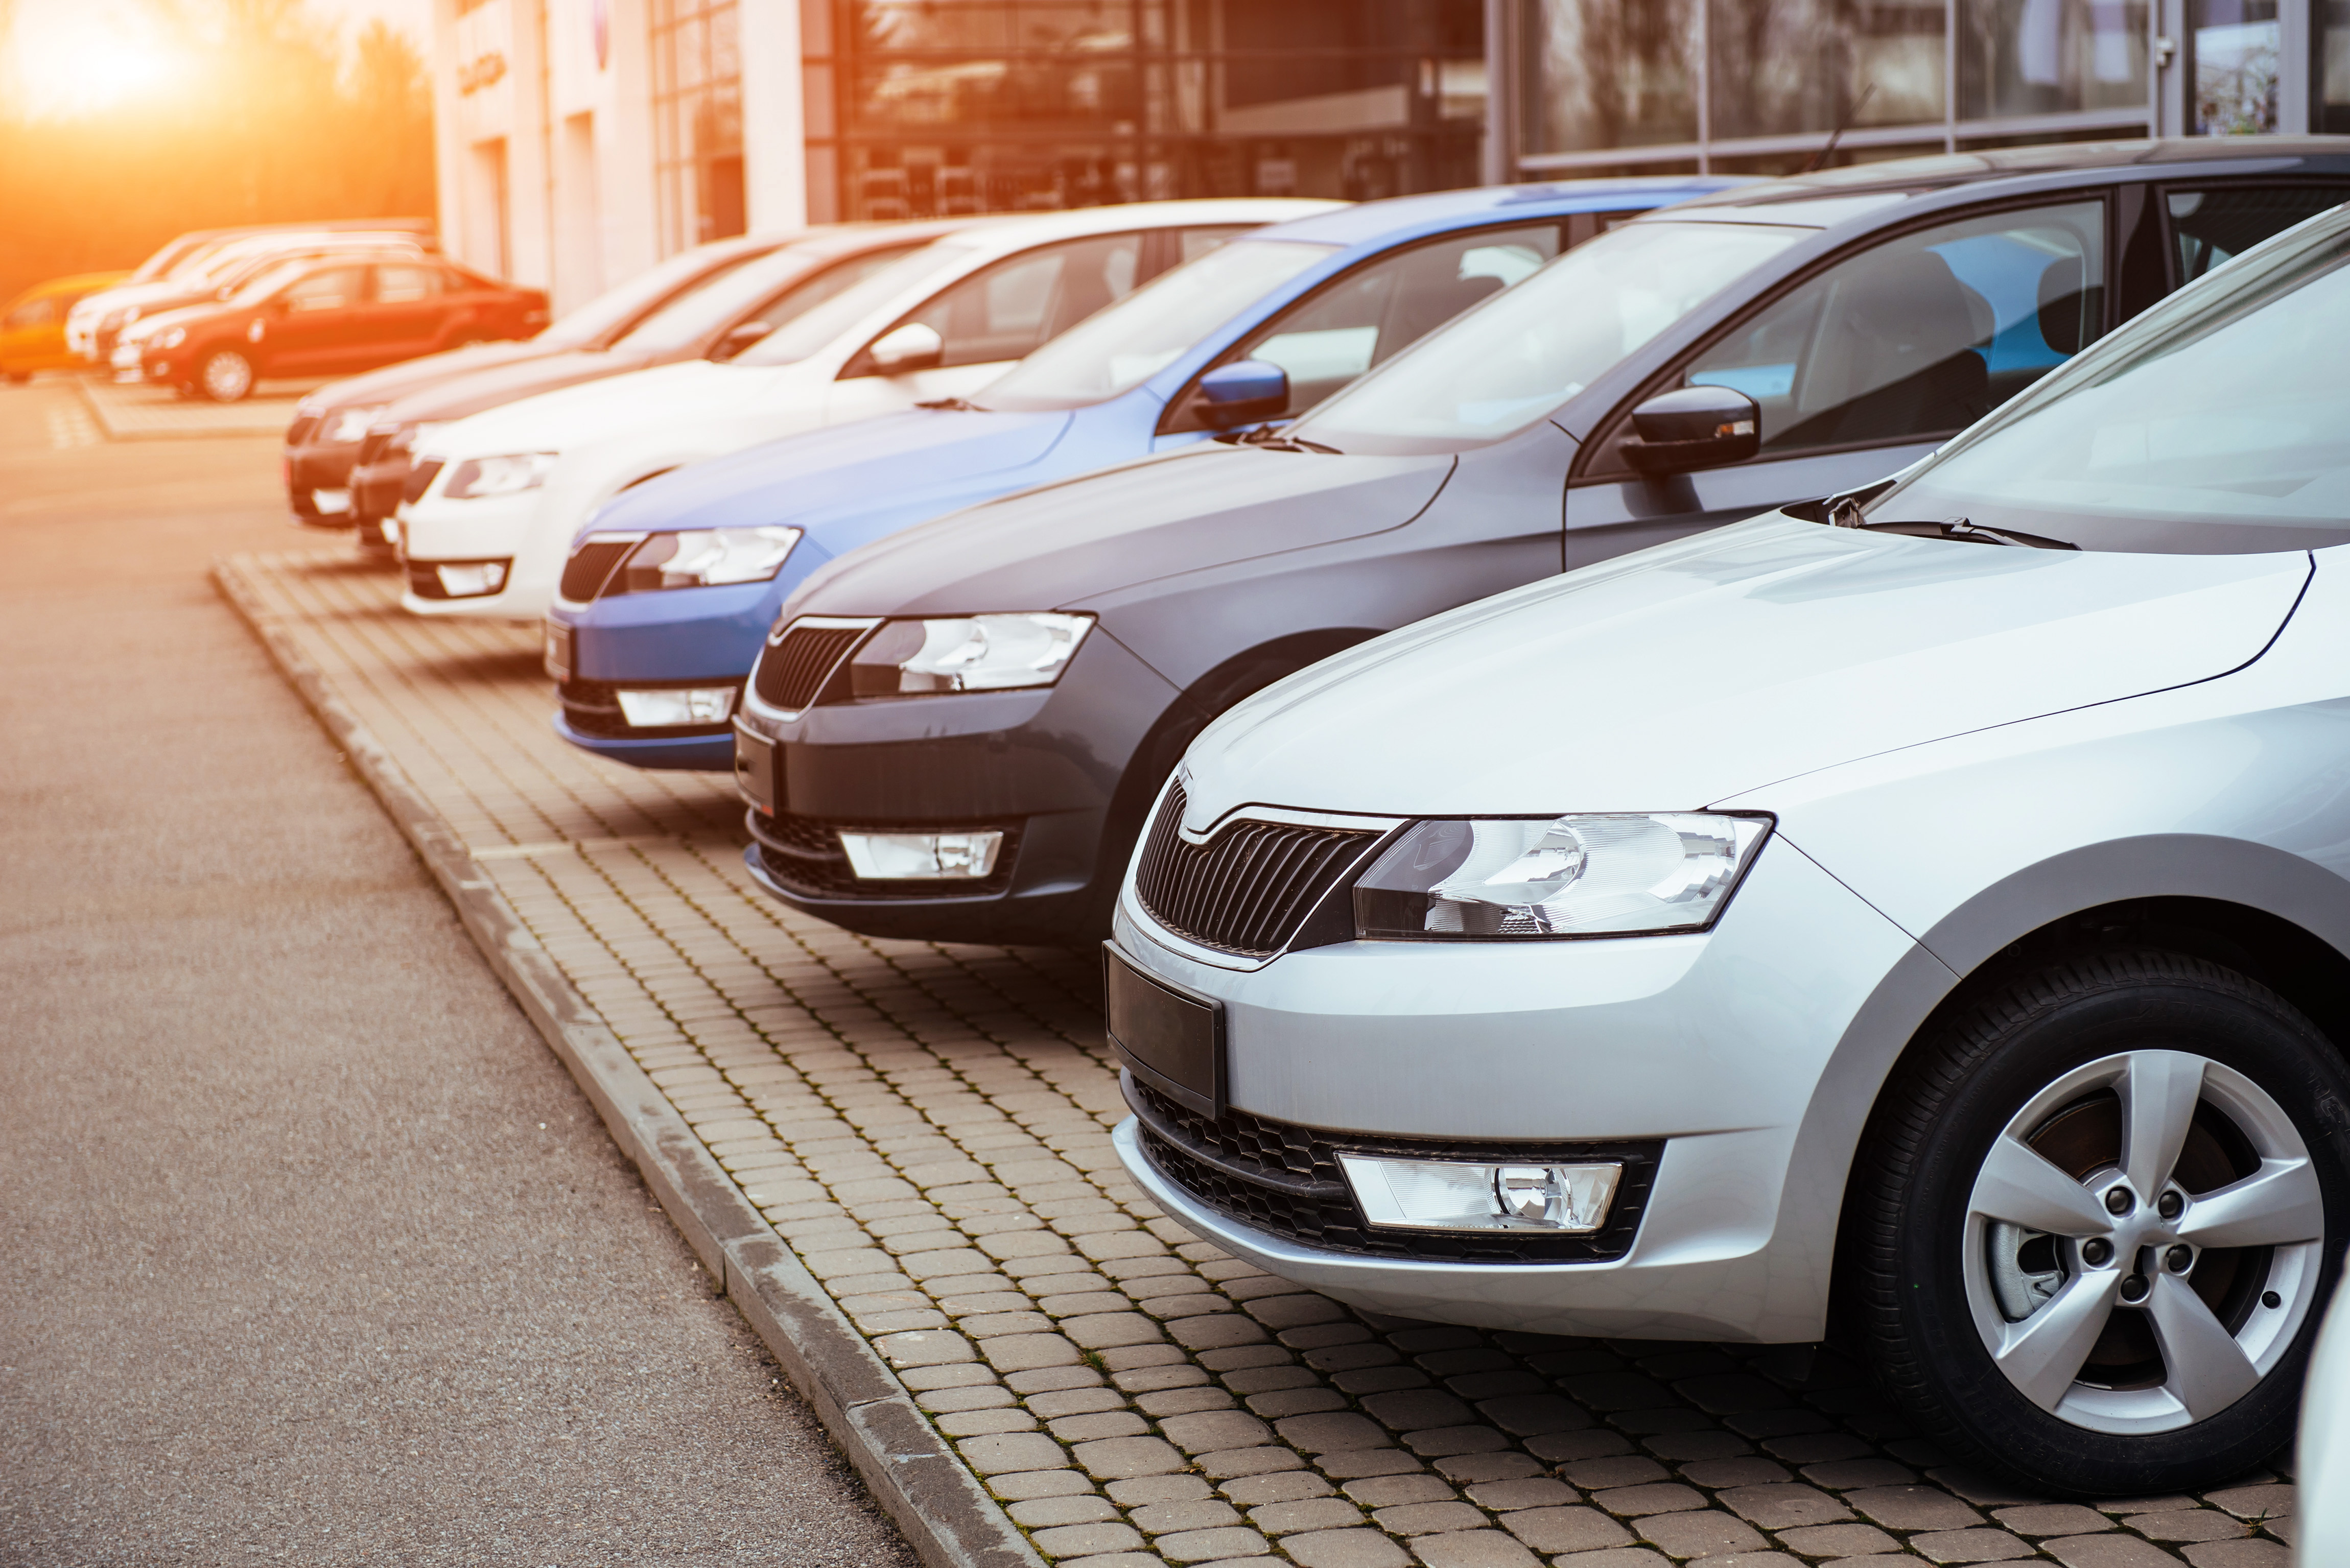 AdobeStock_137250472_row of cars